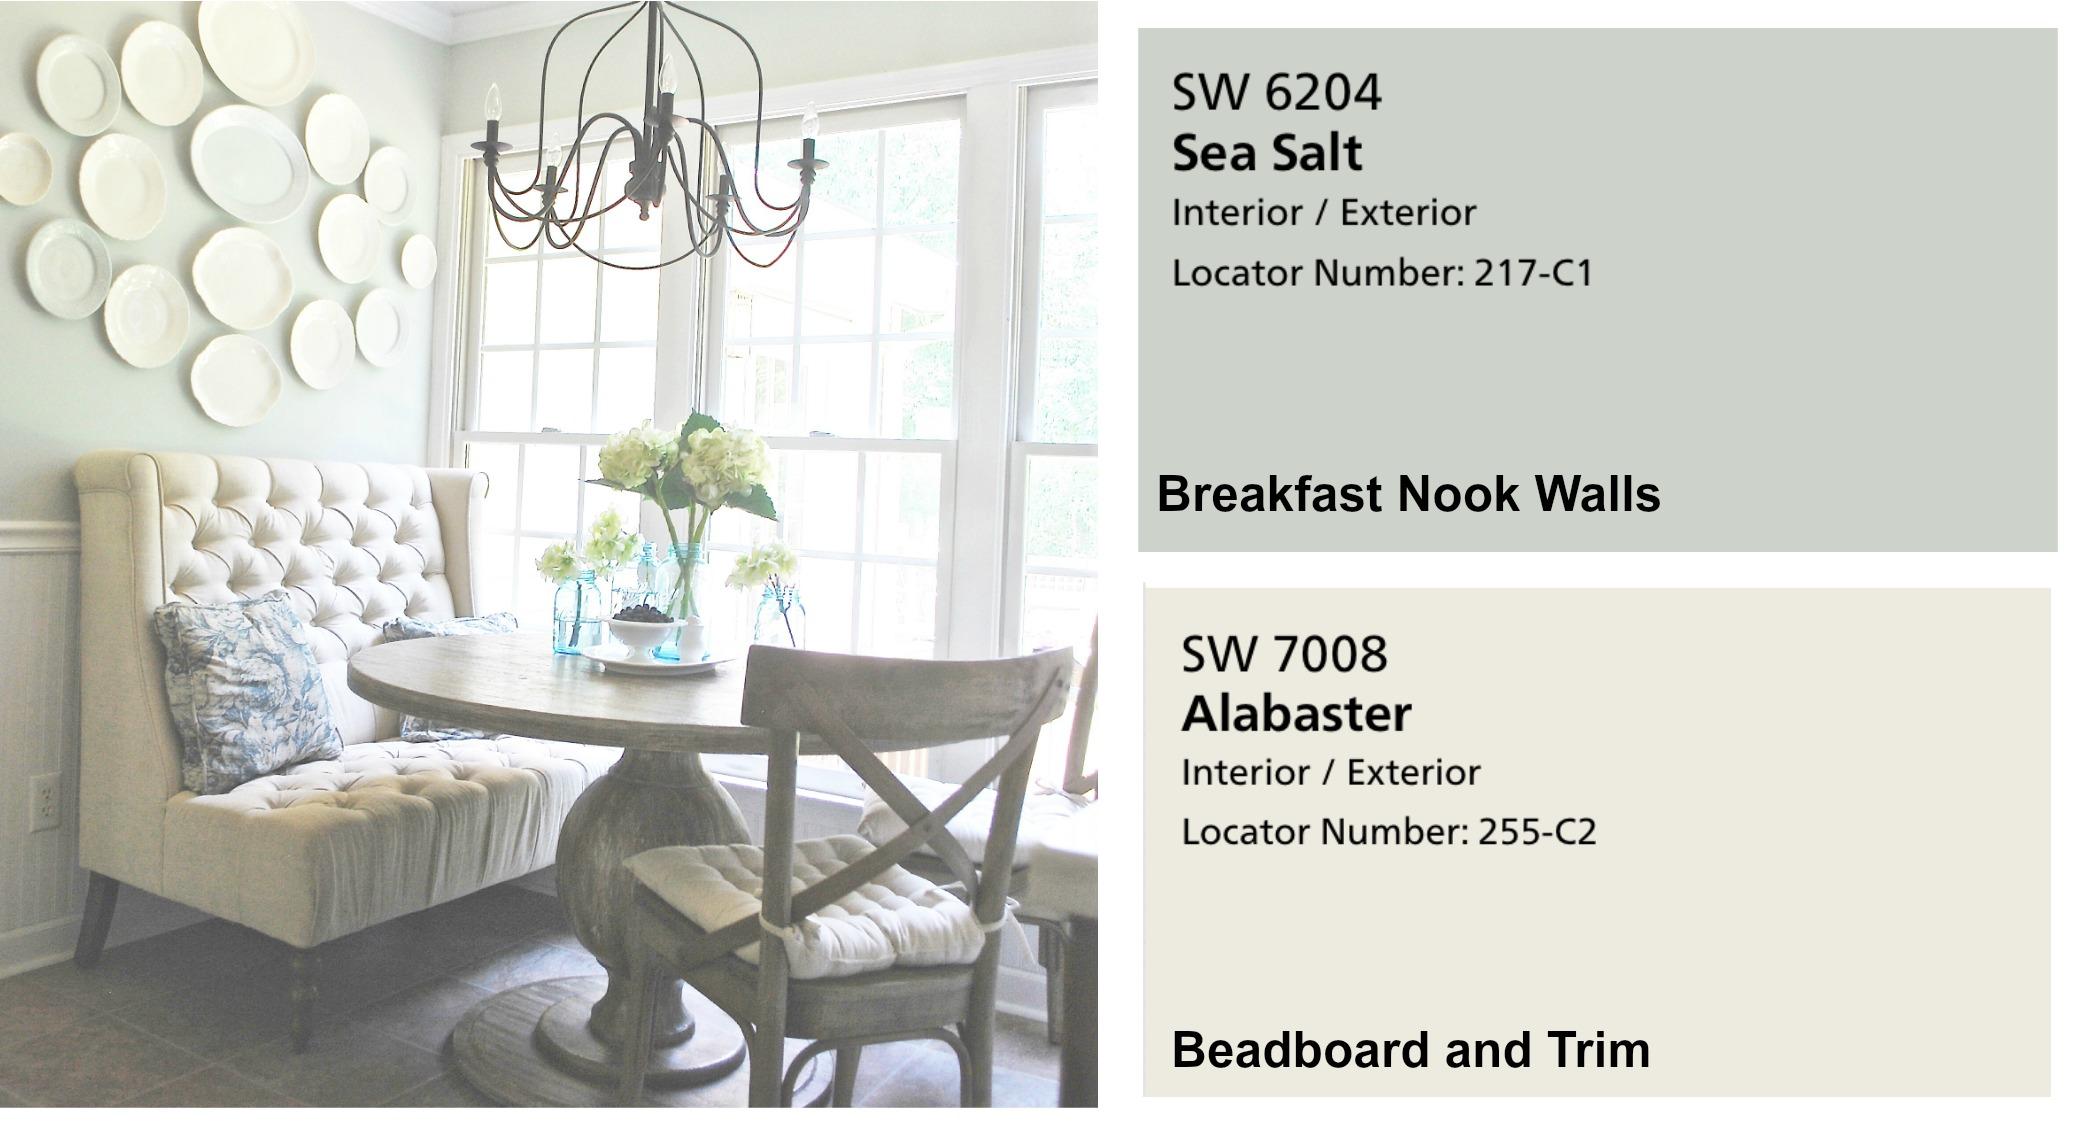 Farmhouse Paint Colors- Breakfast Nook in Sea Salt. Full Home Color Scheme at Plumprettydeoranddesign.com